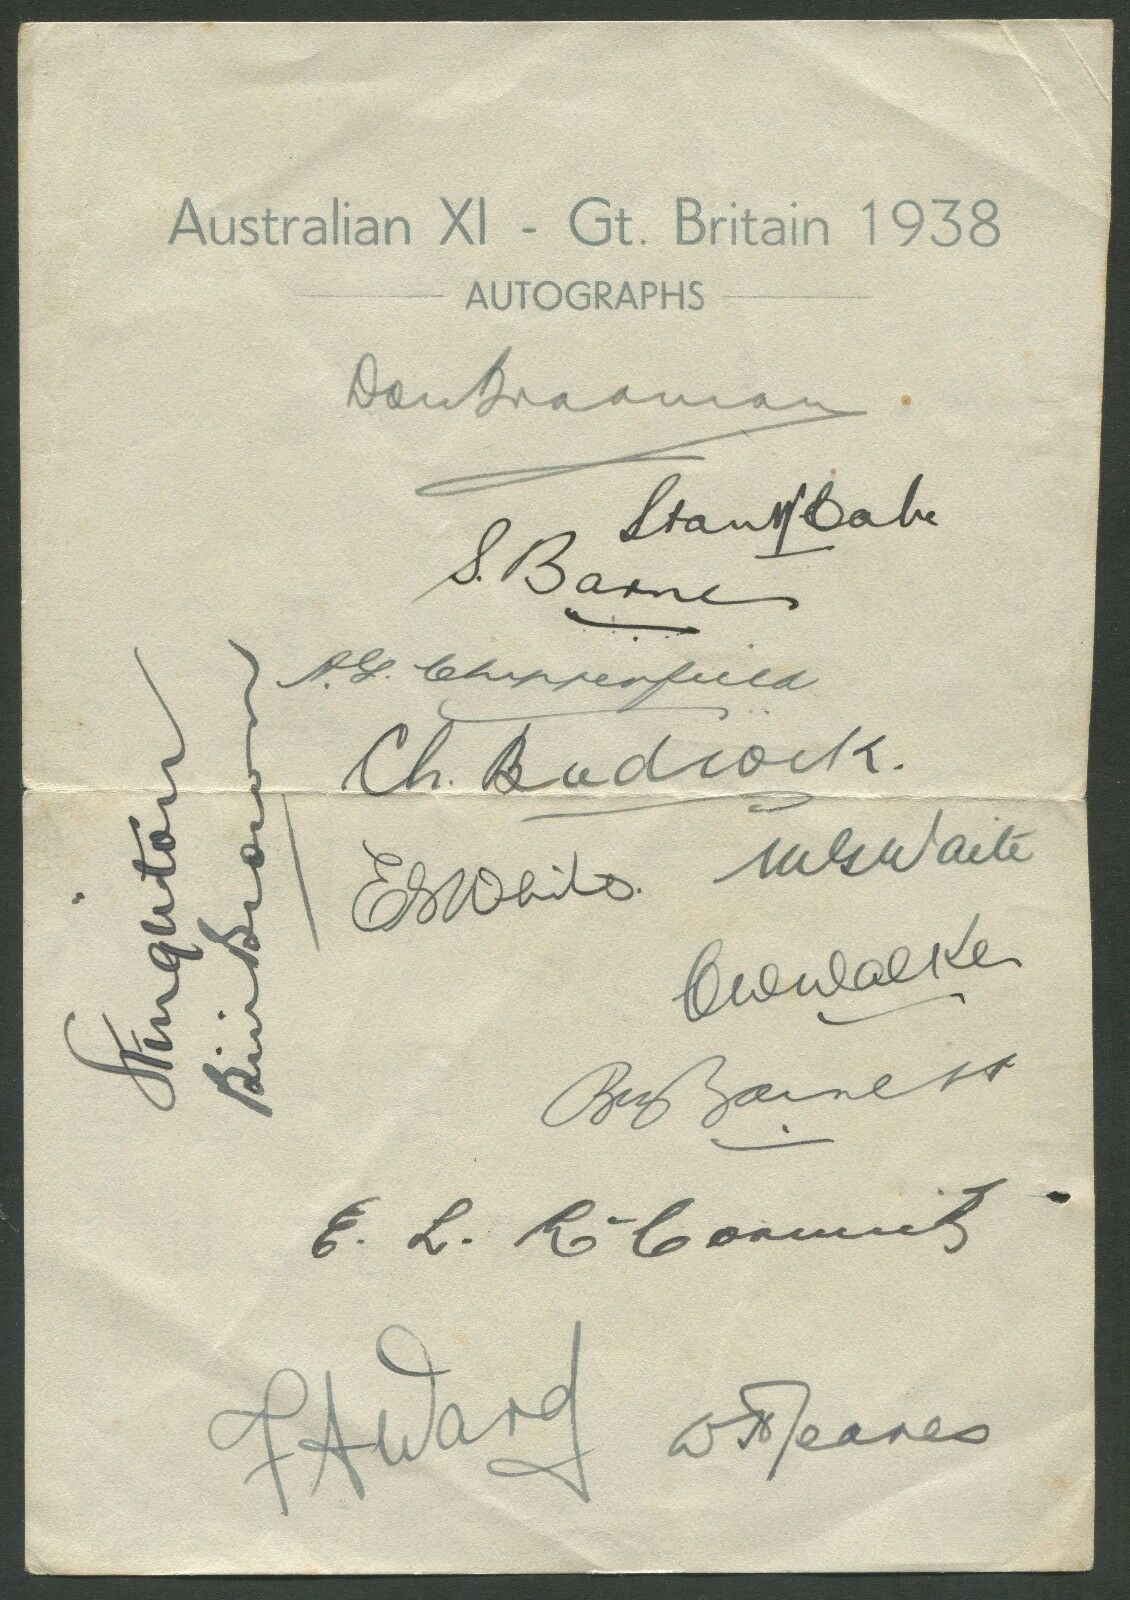 1938 AUSTRALIAN TEAM official team sheet. 14 signatures including Don Bradman